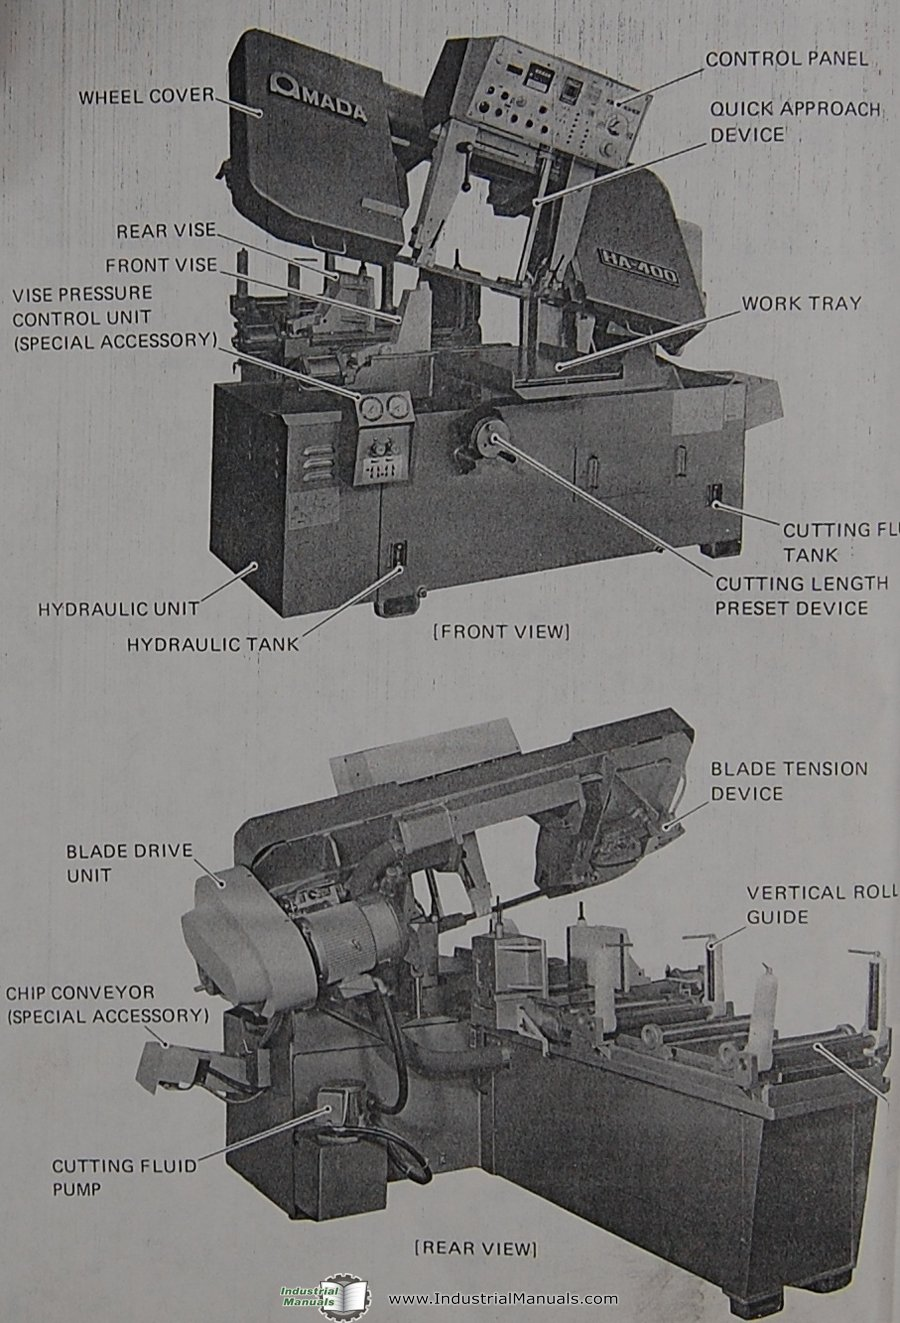 Amada HA-400, Horizontal Band Saw, Operations and Parts List Manual: Amada:  Amazon.com: Books